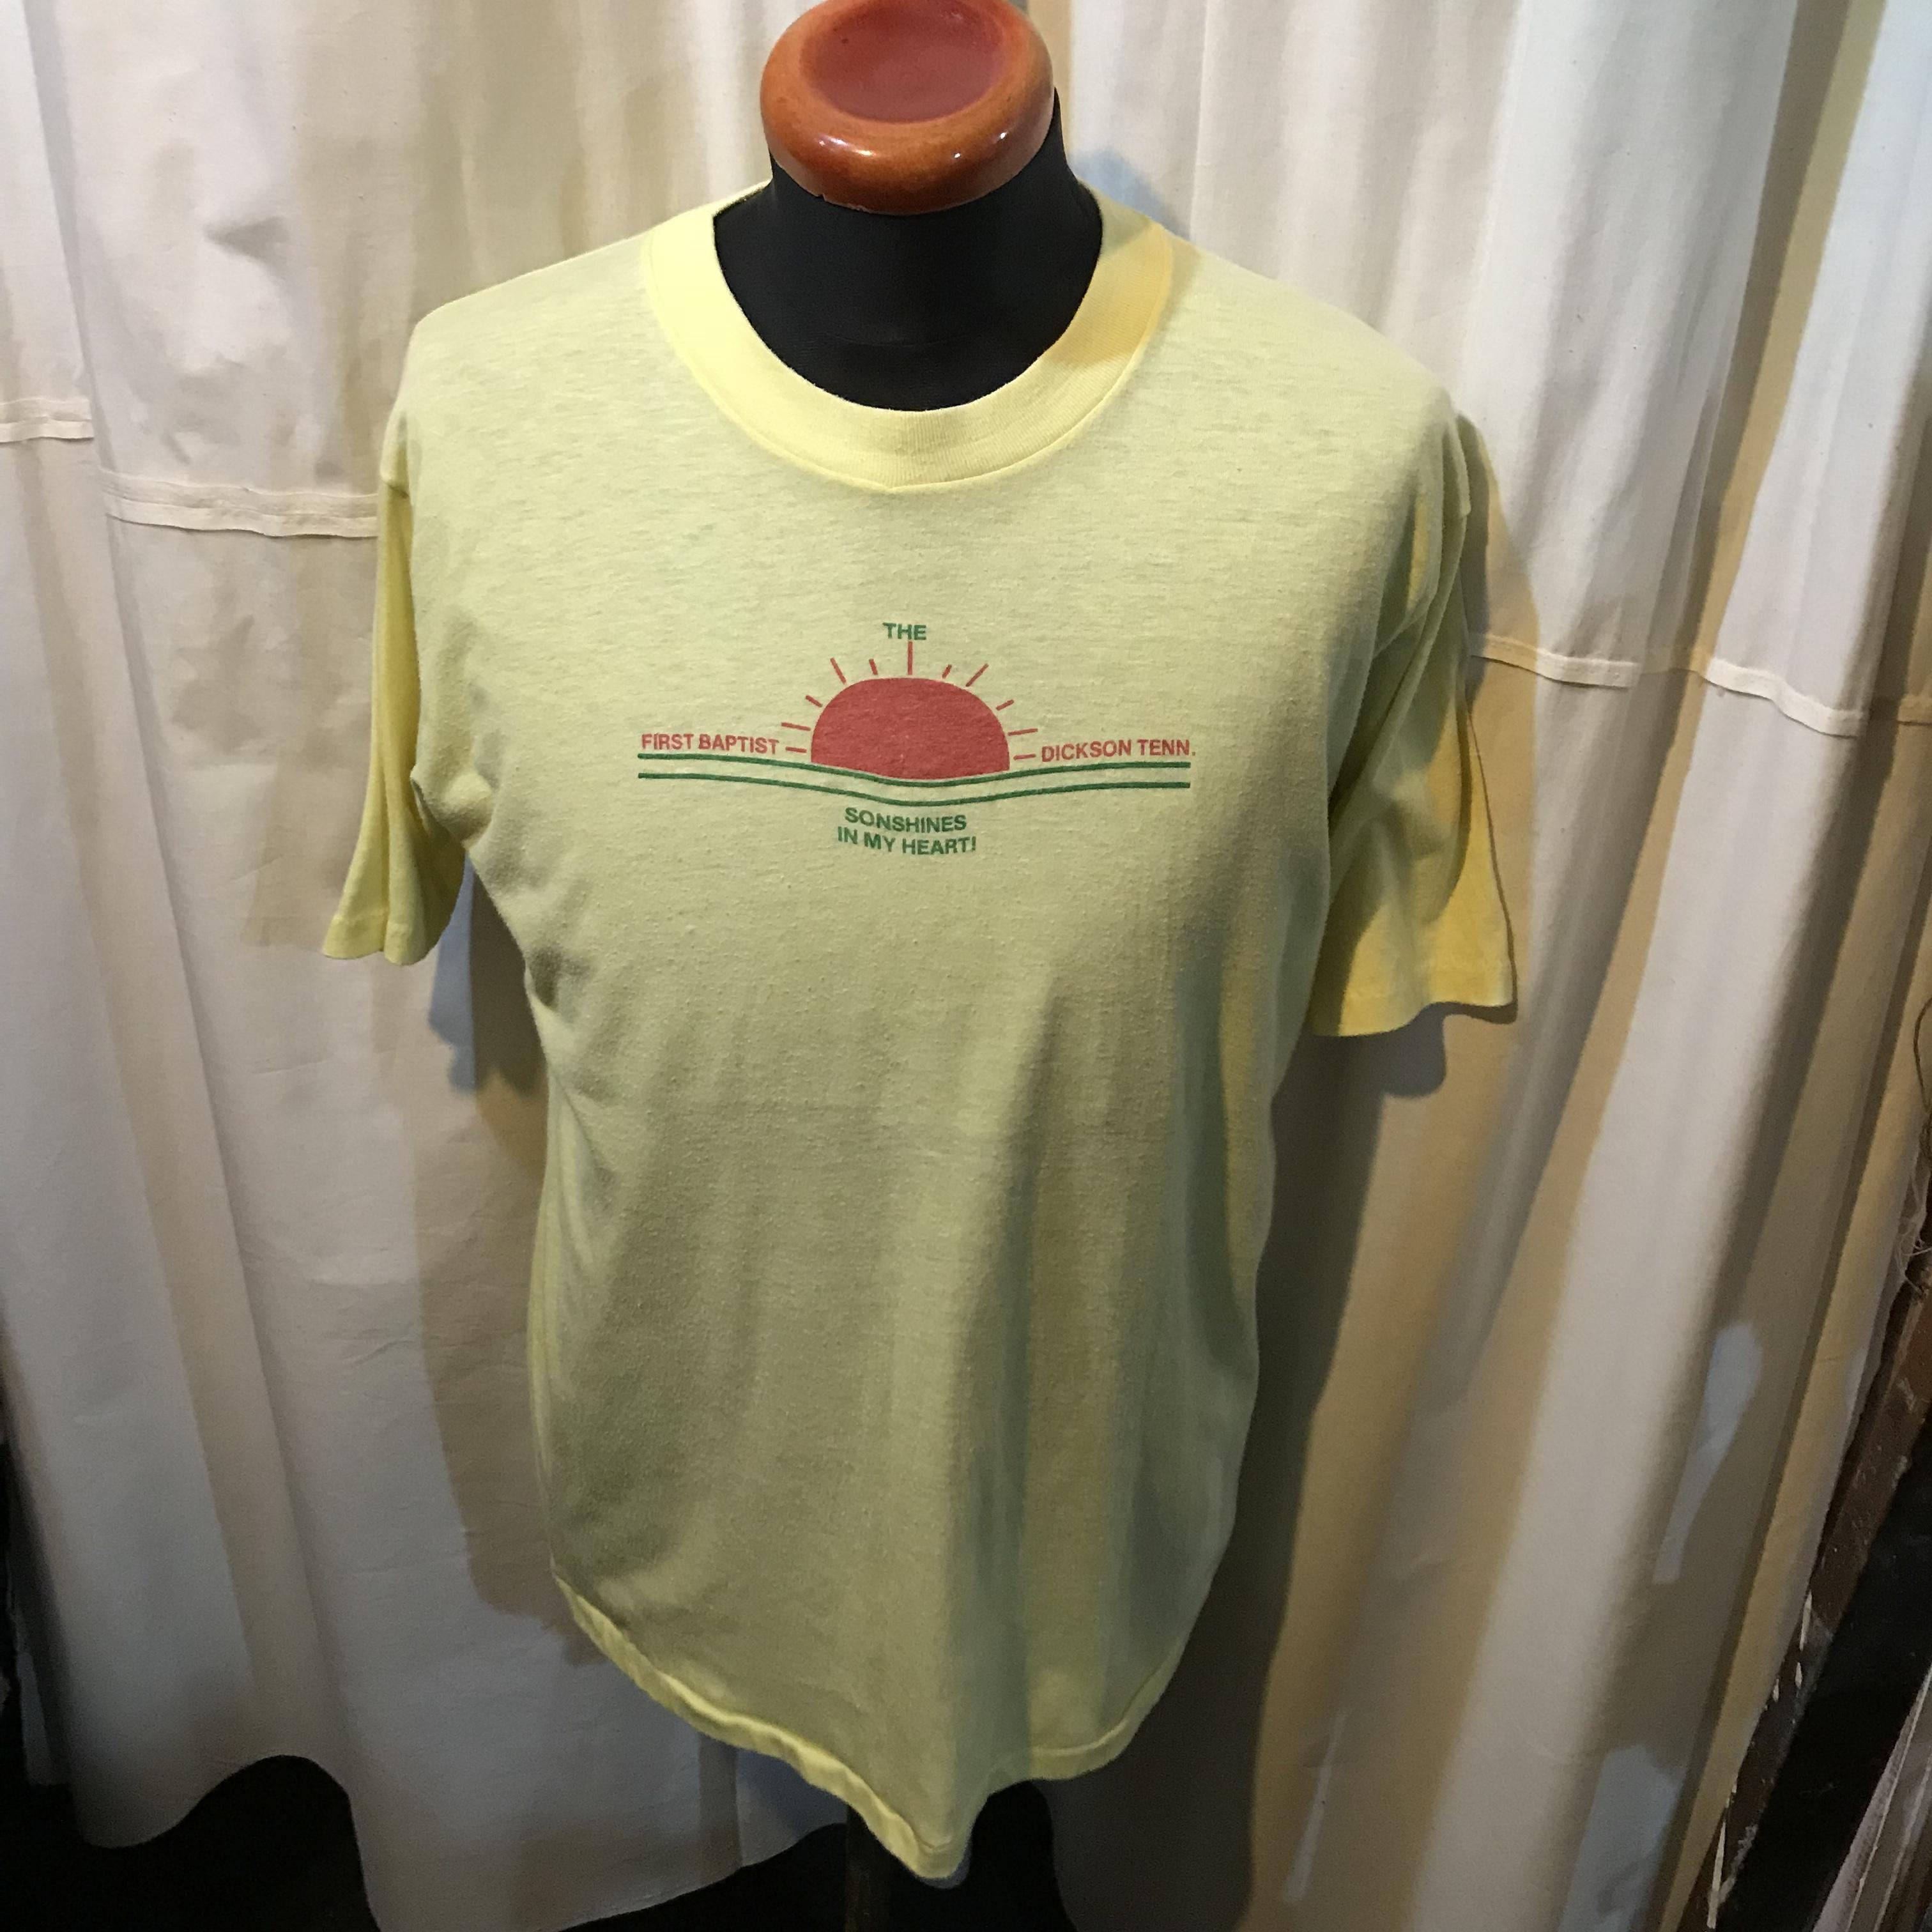 70's vintage アメリカ製 Velva Sheen 半袖Tシャツ メンズM~L